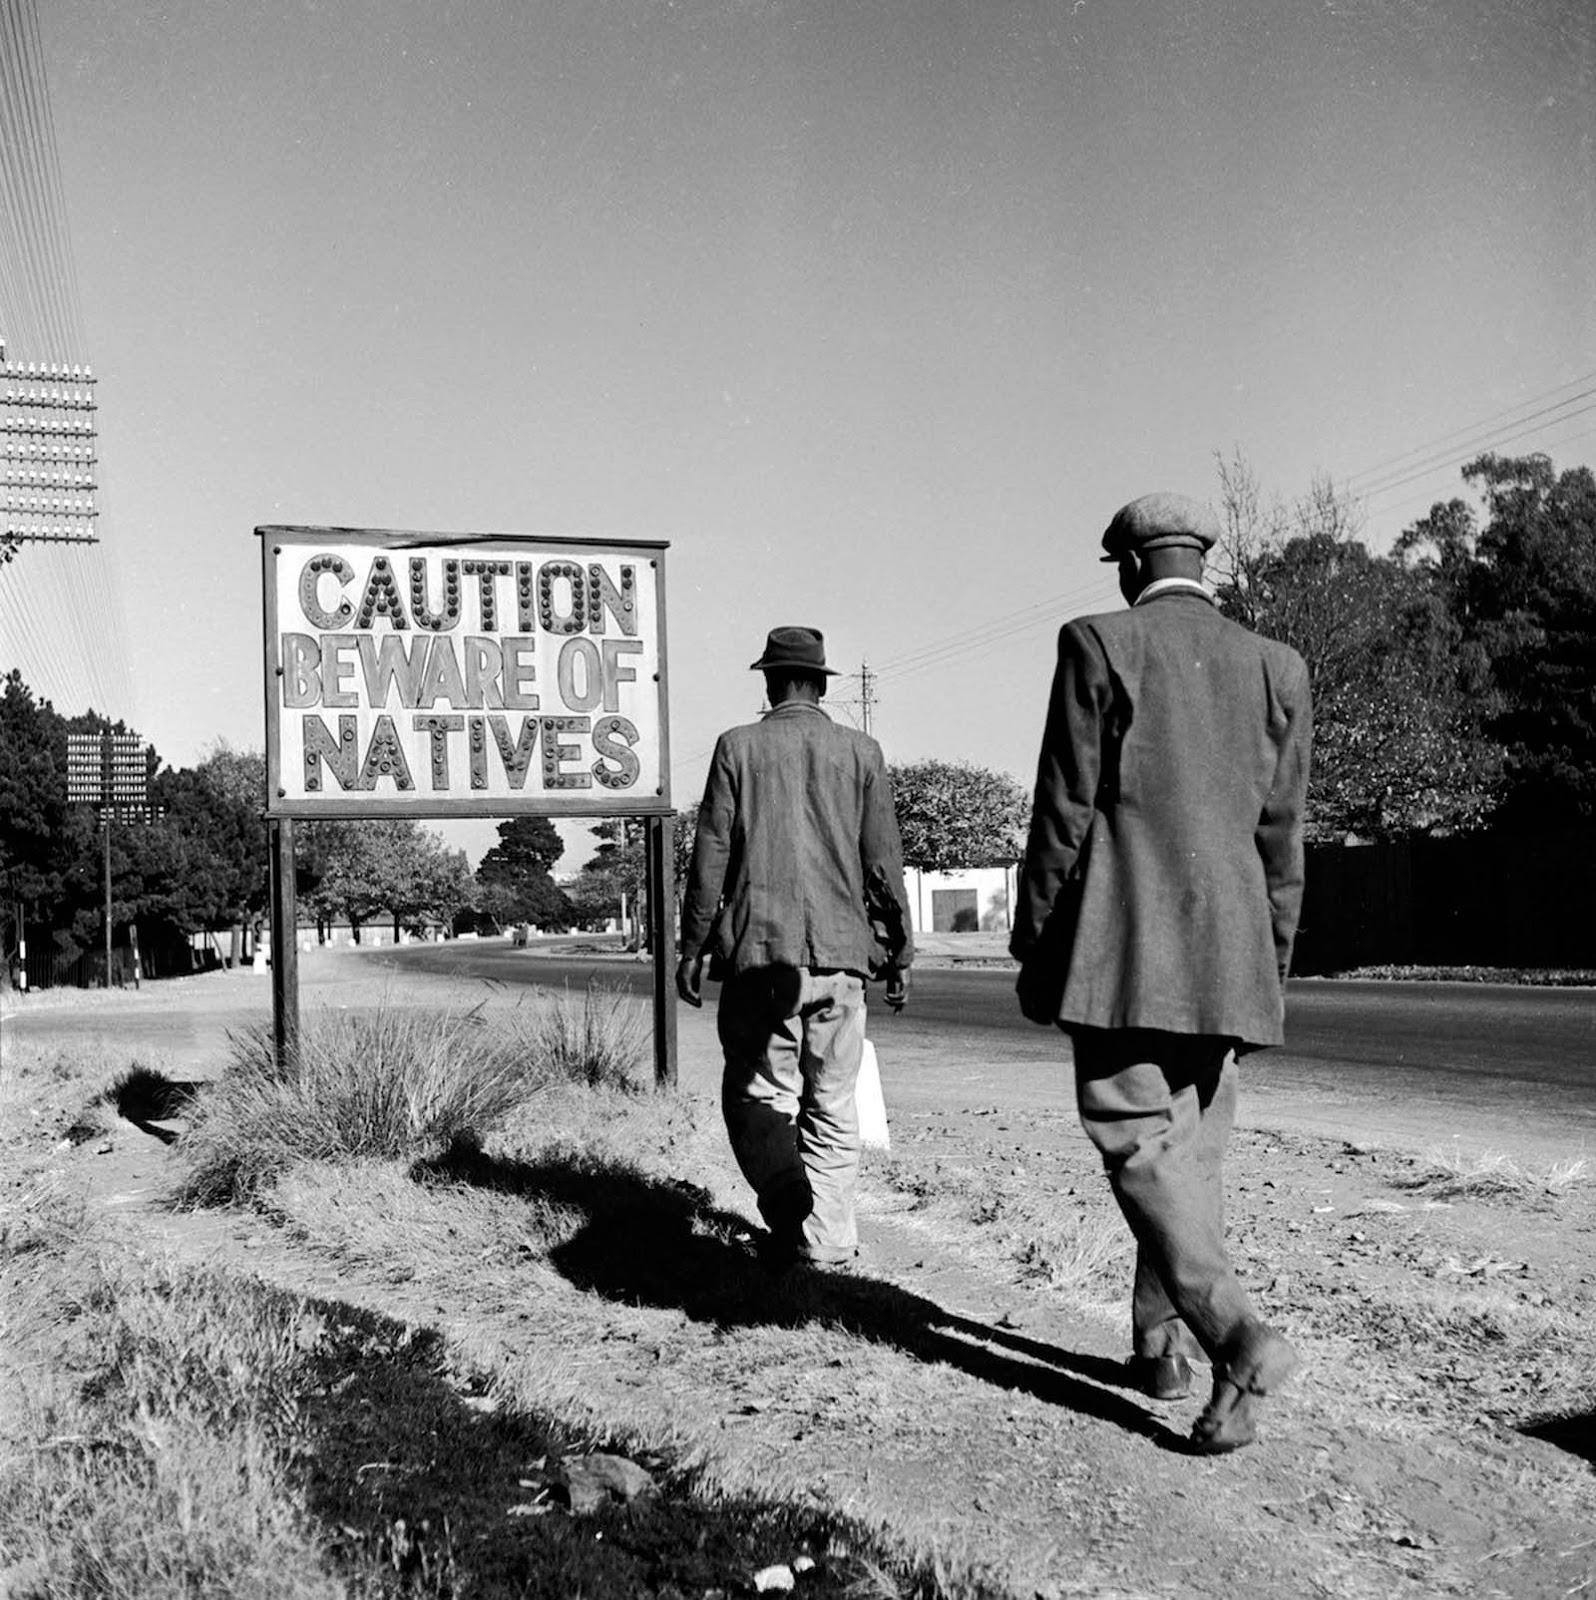 <p>Често срещан знак в Йоханесбург, 1956 г.</p>